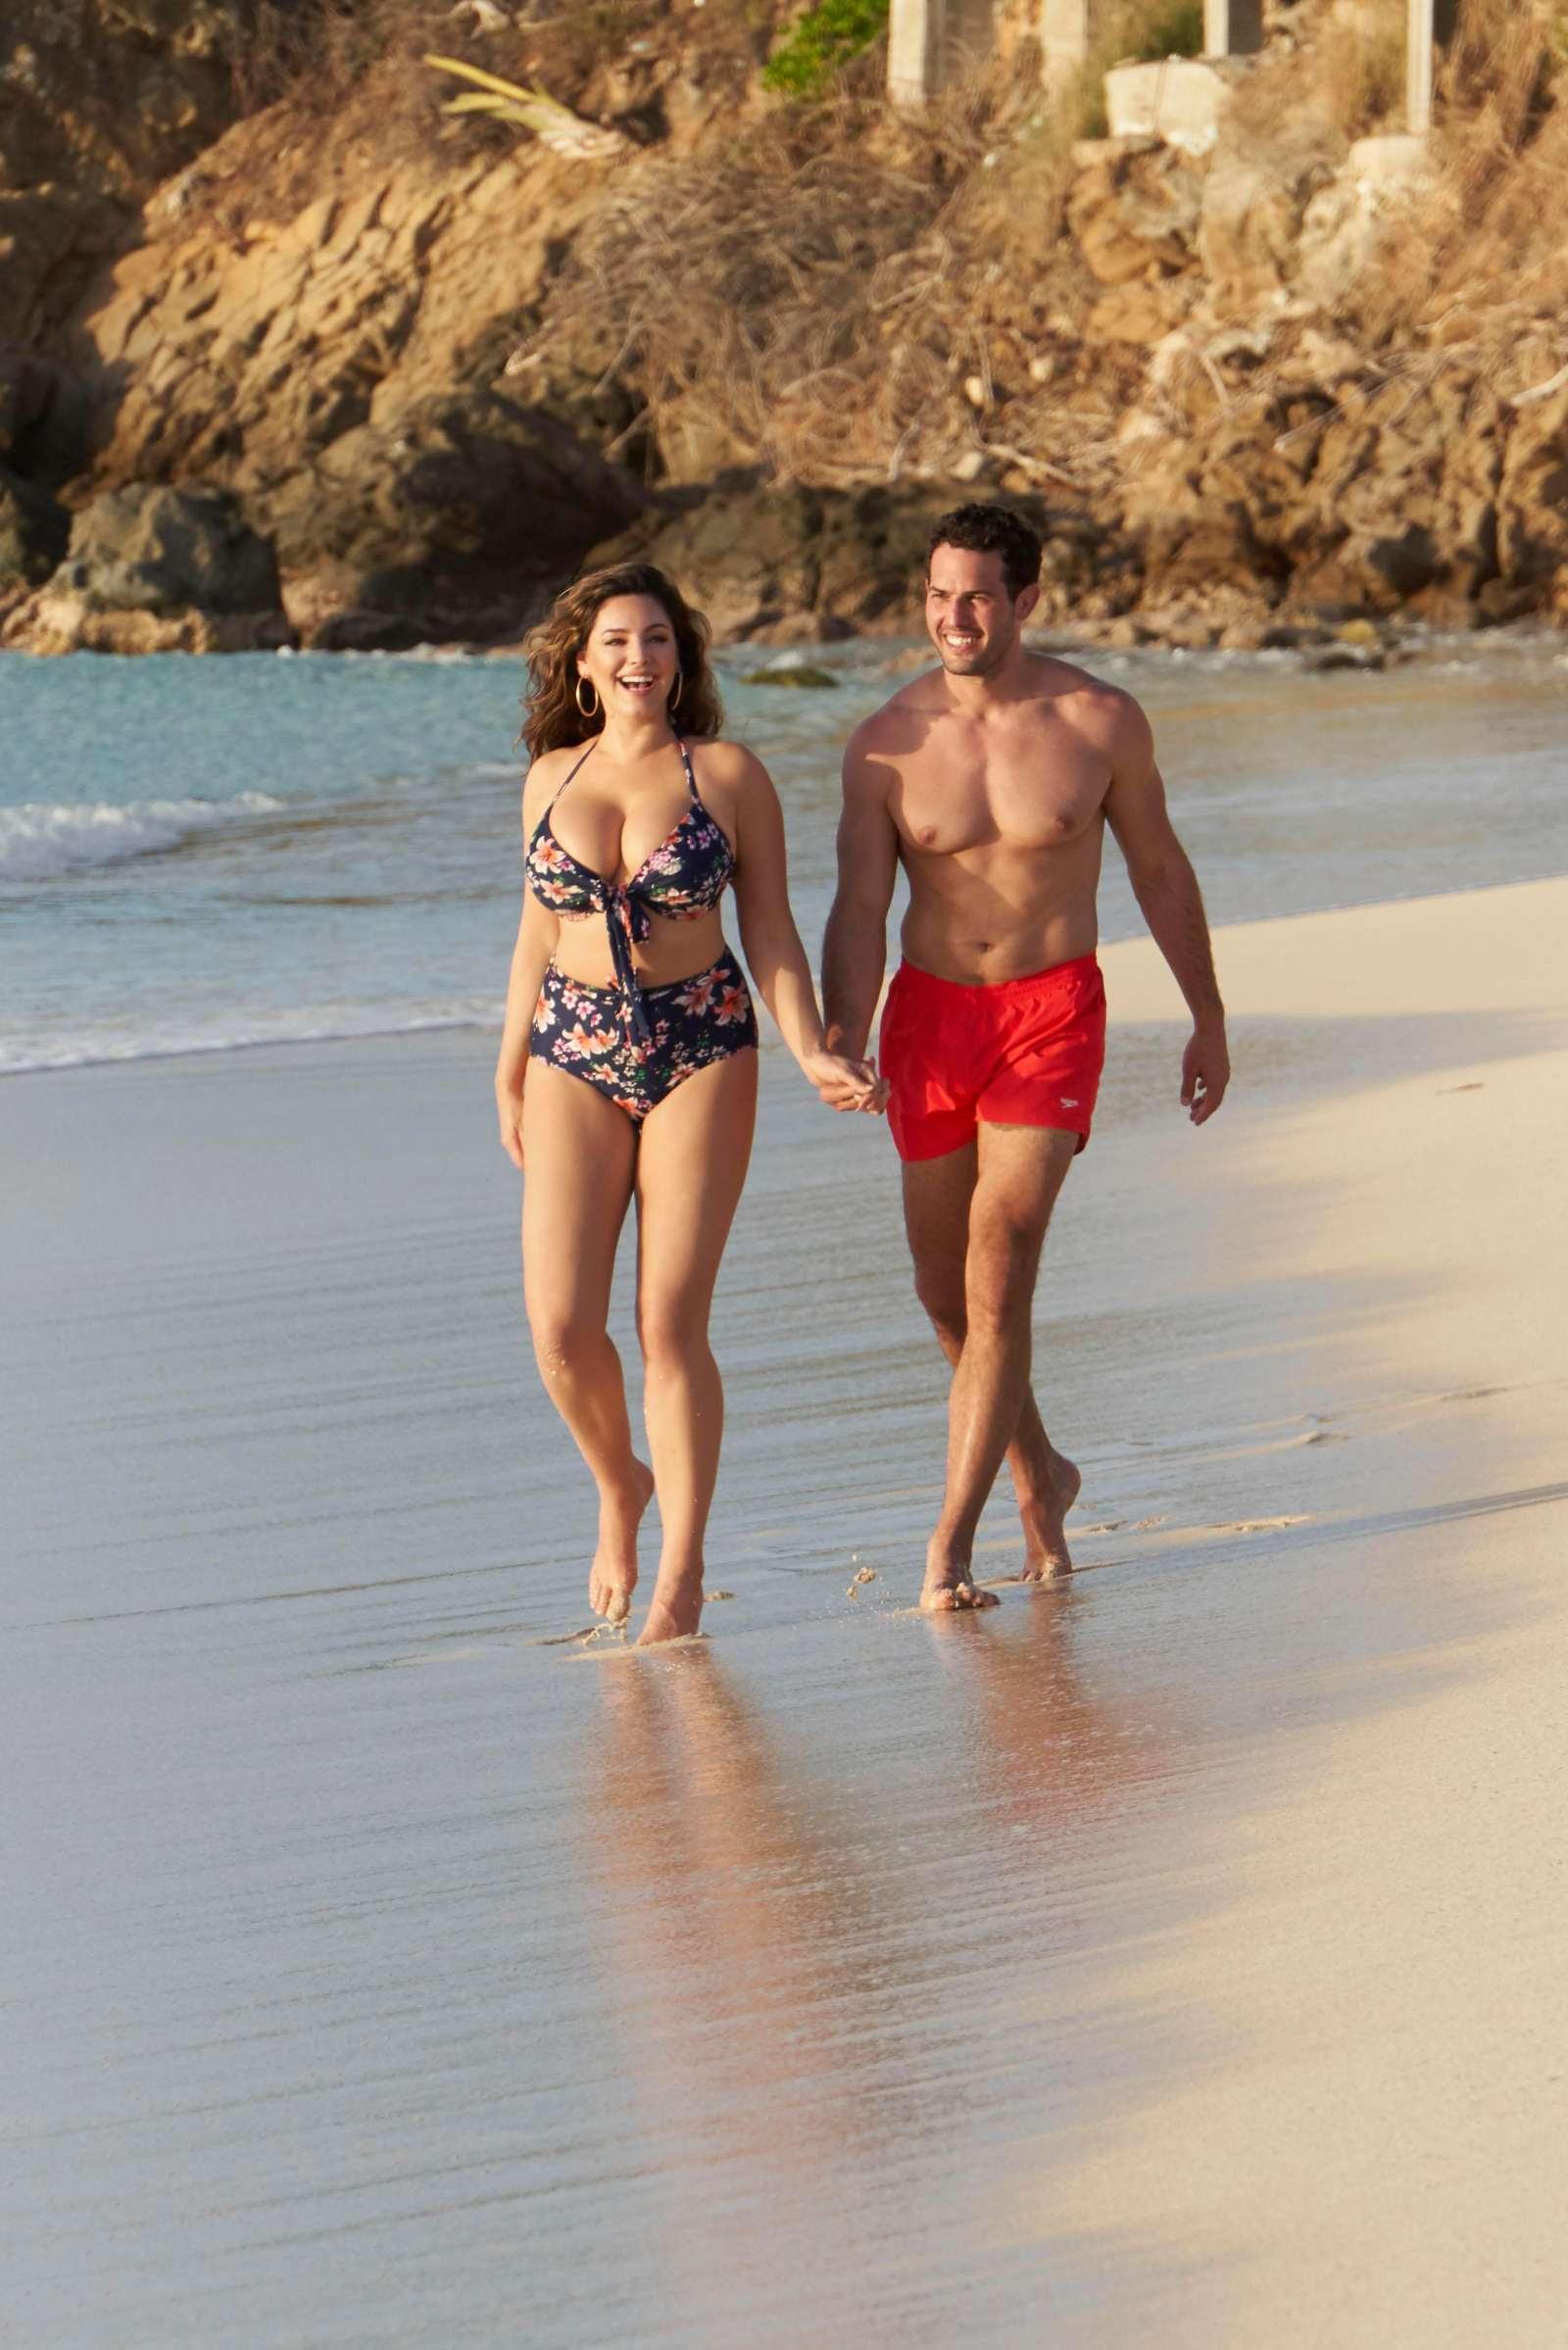 Kelly Brook in Floral Bikini with boyfriend in Antigua